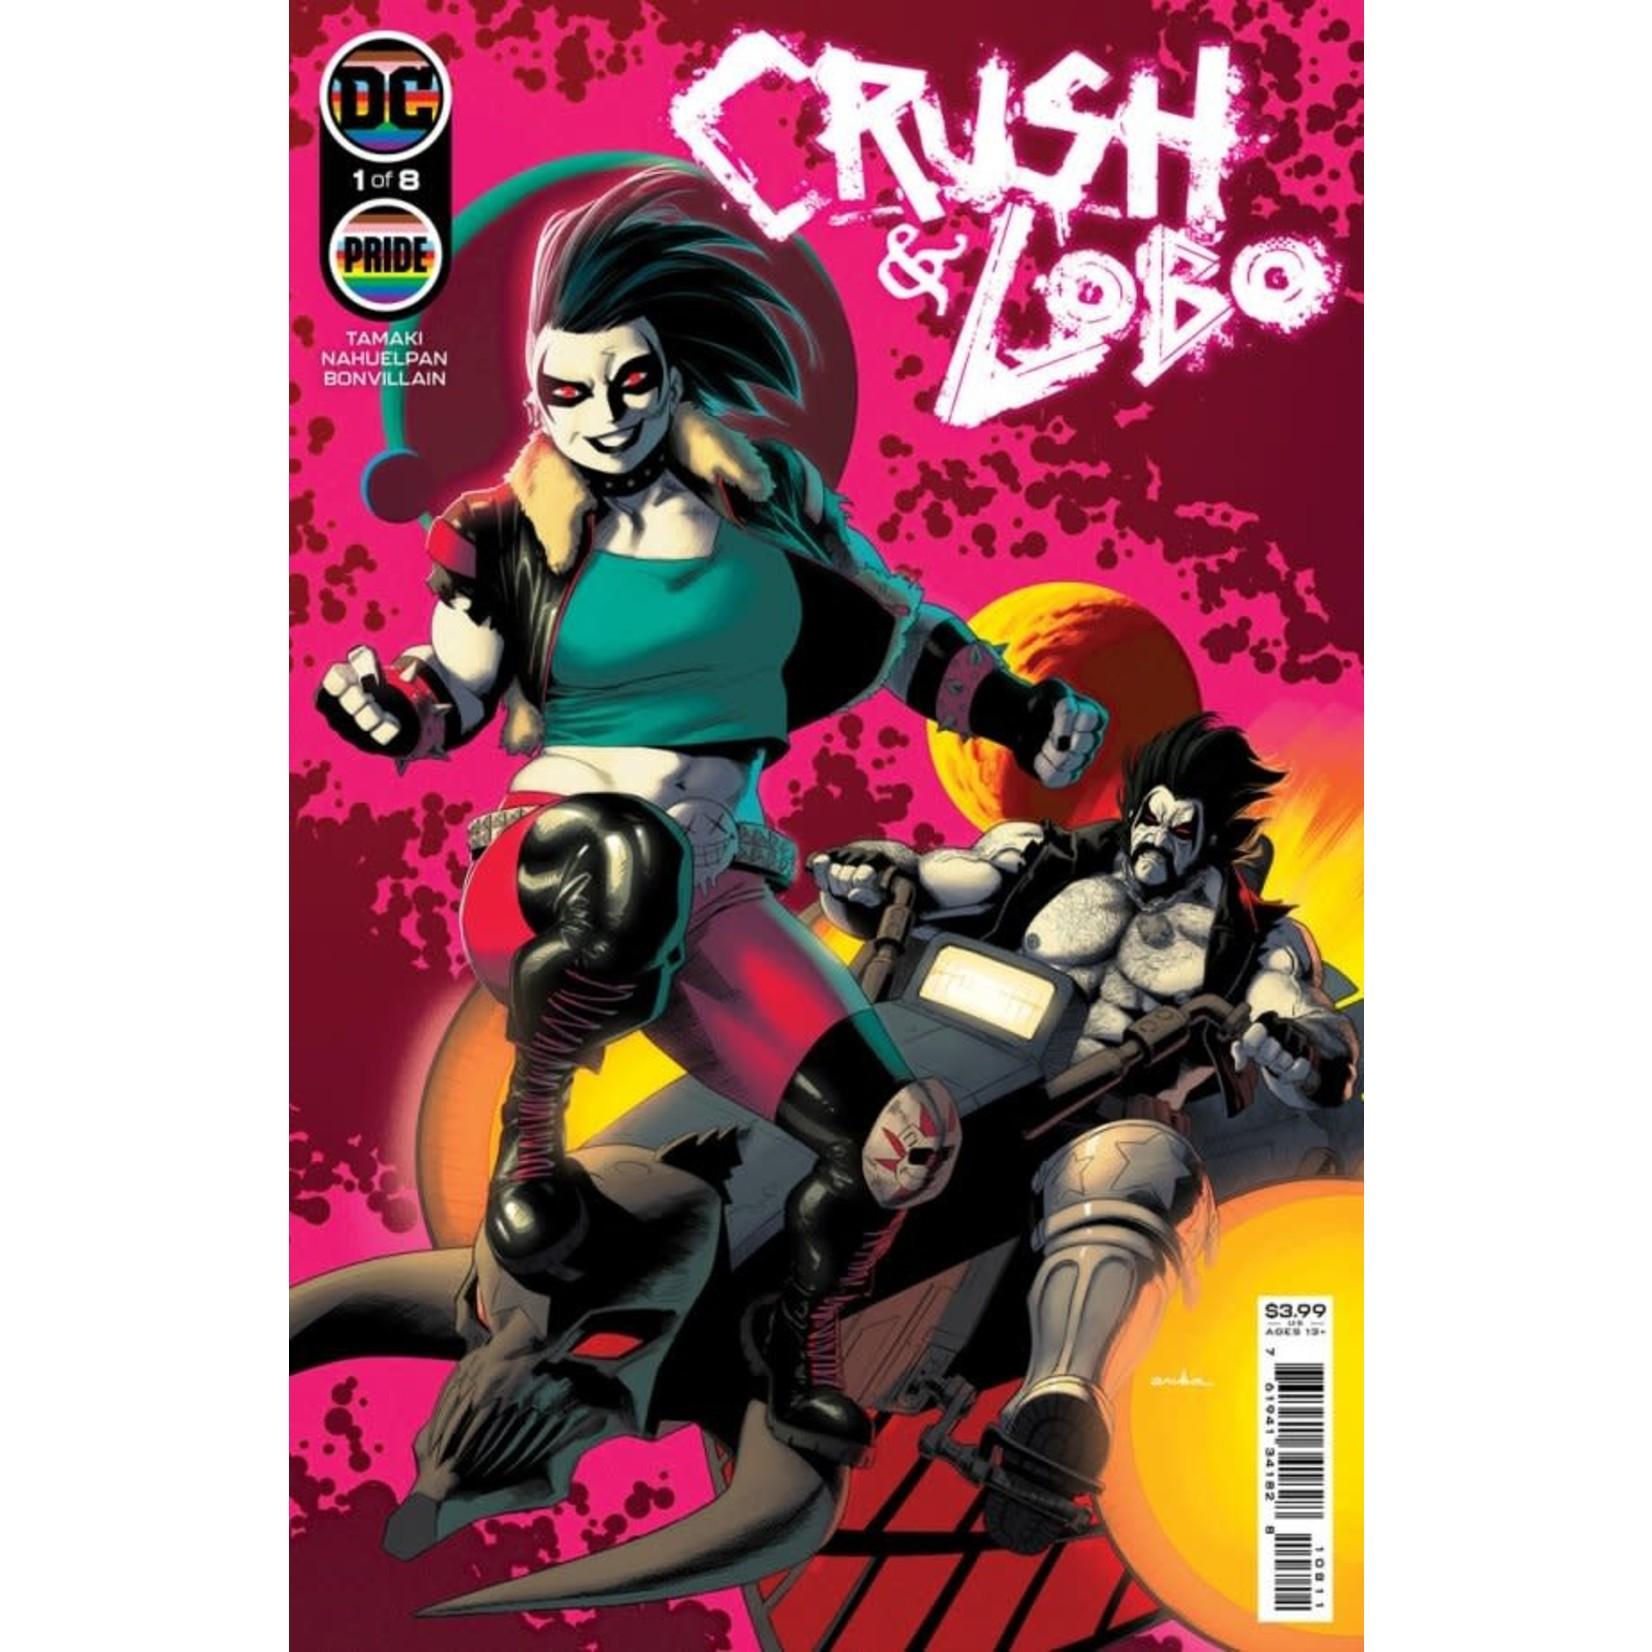 DC Comics CRUSH & LOBO #1 (OF 8) CVR A KRIS ANKA